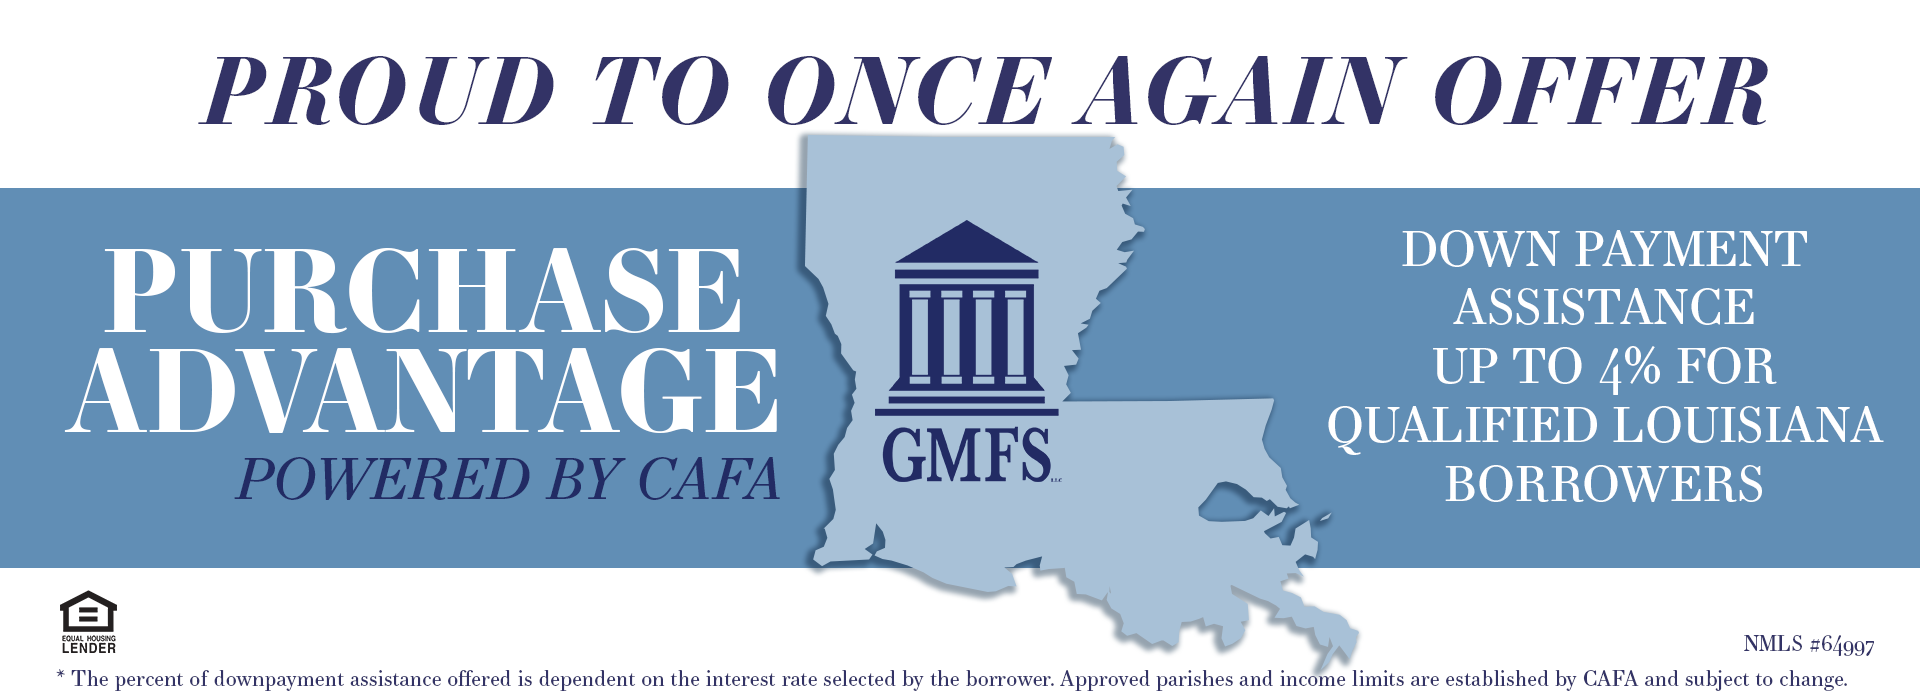 Purchase Advantage Agent Bank Loan